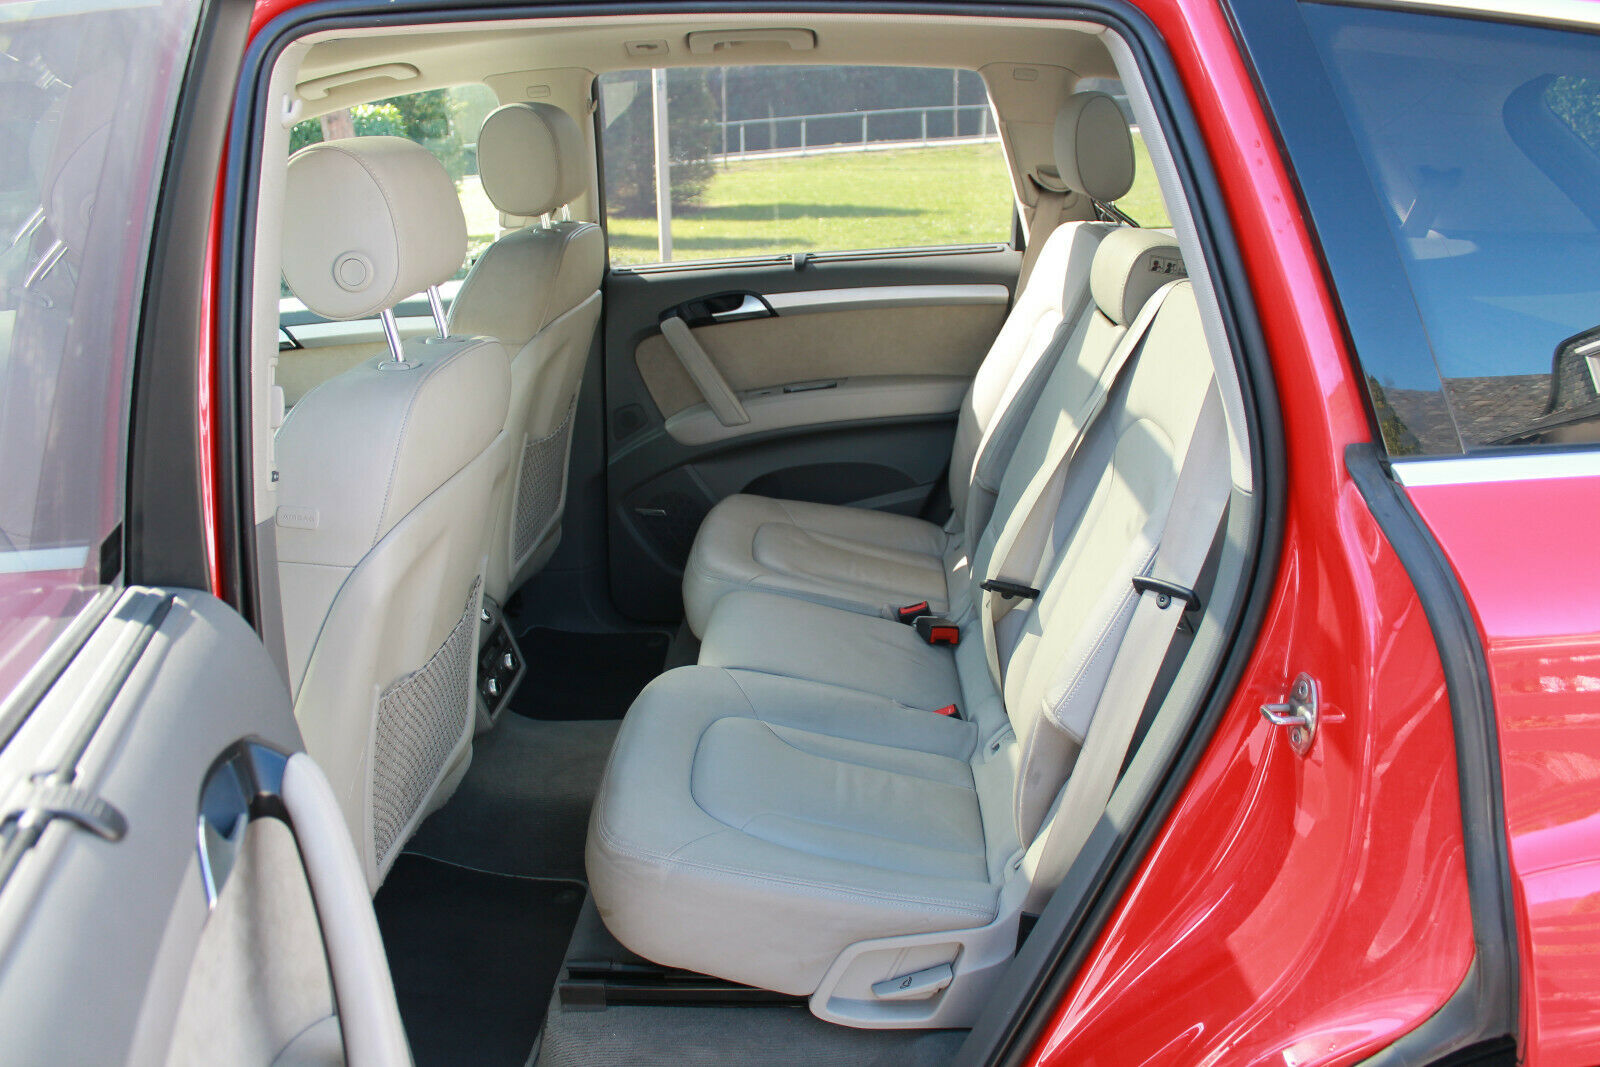 Audi Q7 V12 TDI arrière